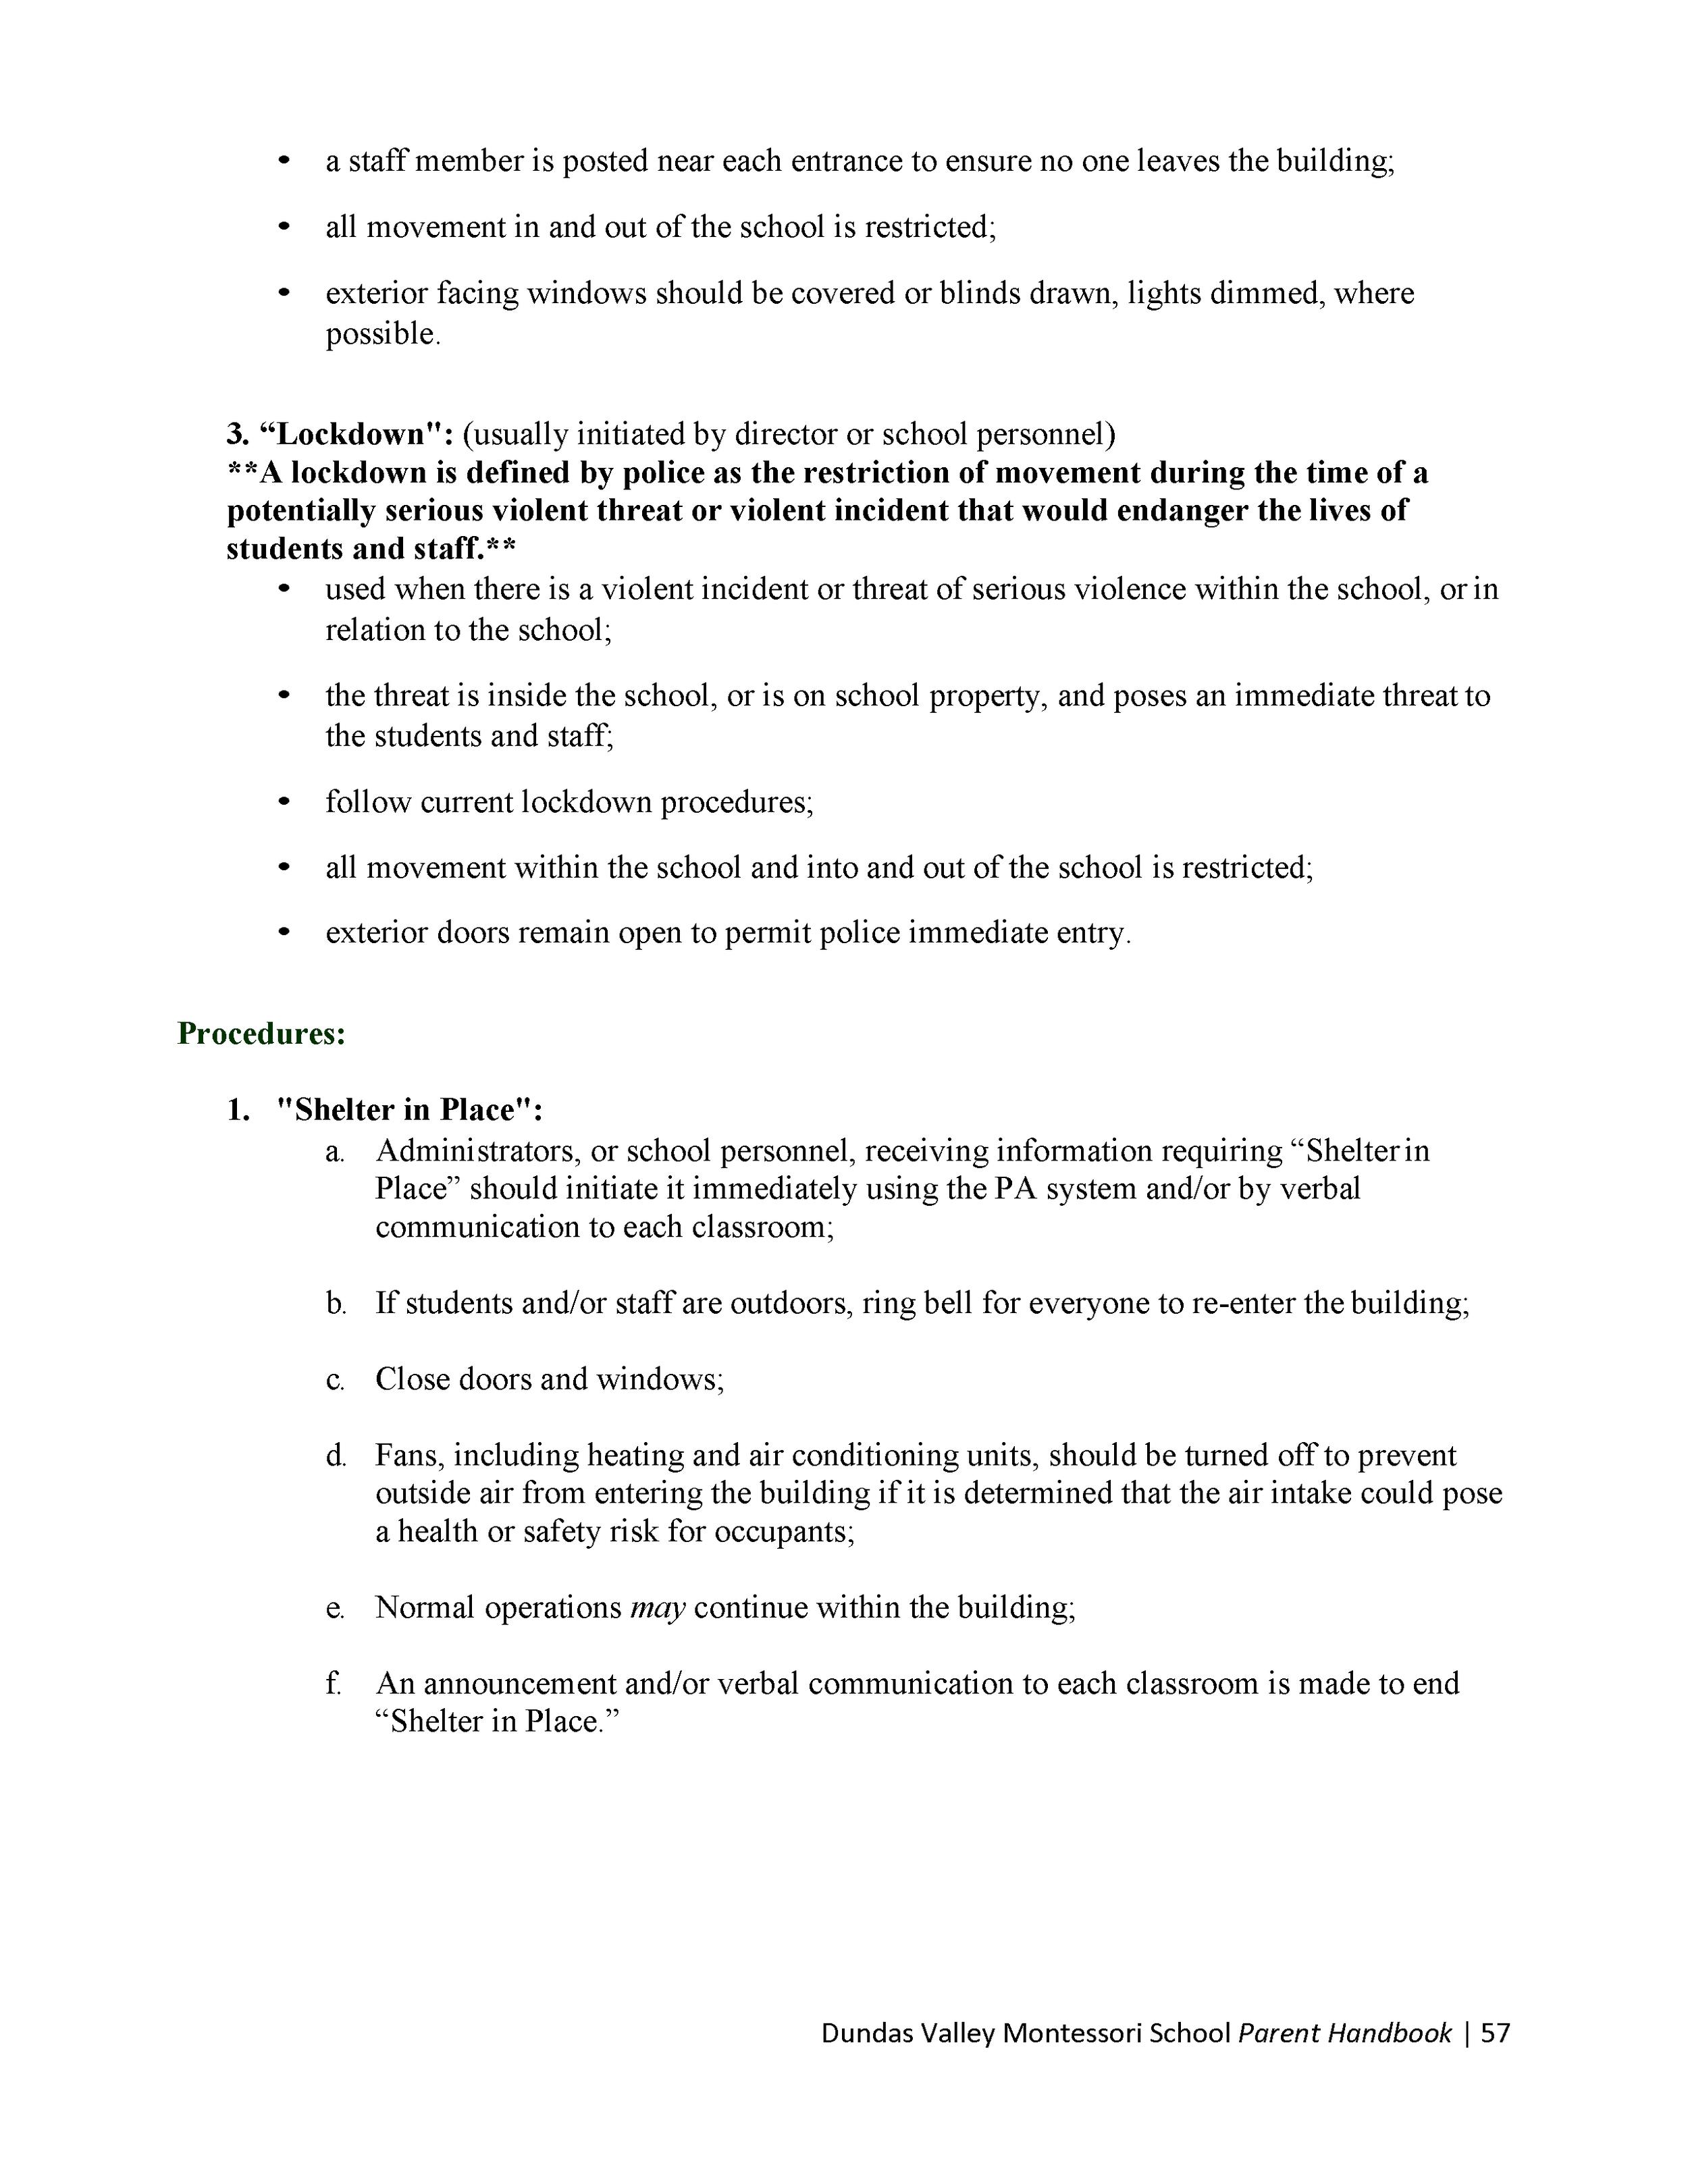 DVMS-Parent-Handbook-19-20_Page_059.png